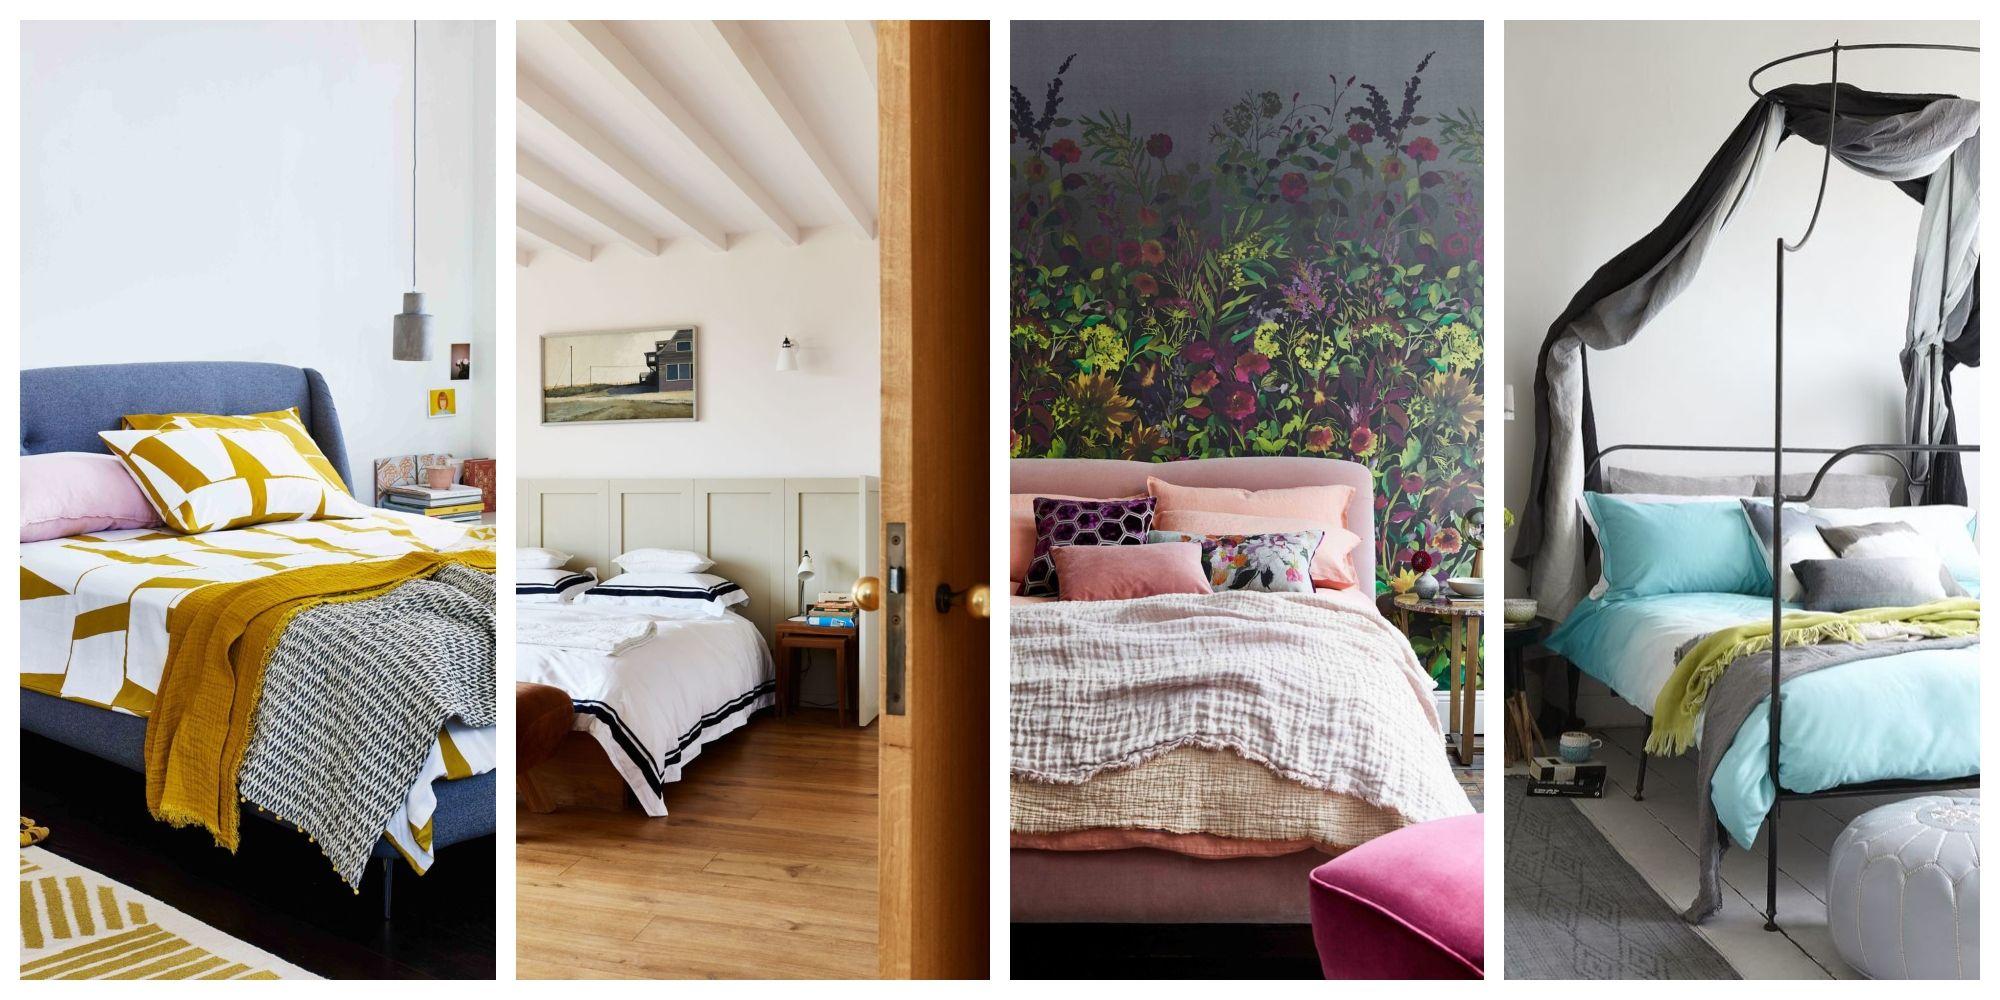 40 beautiful bedroom decorating ideas modern bedroom ideas rh housebeautiful com beautiful 3 bedroom houses pictures beautiful 3 bedroom houses pictures